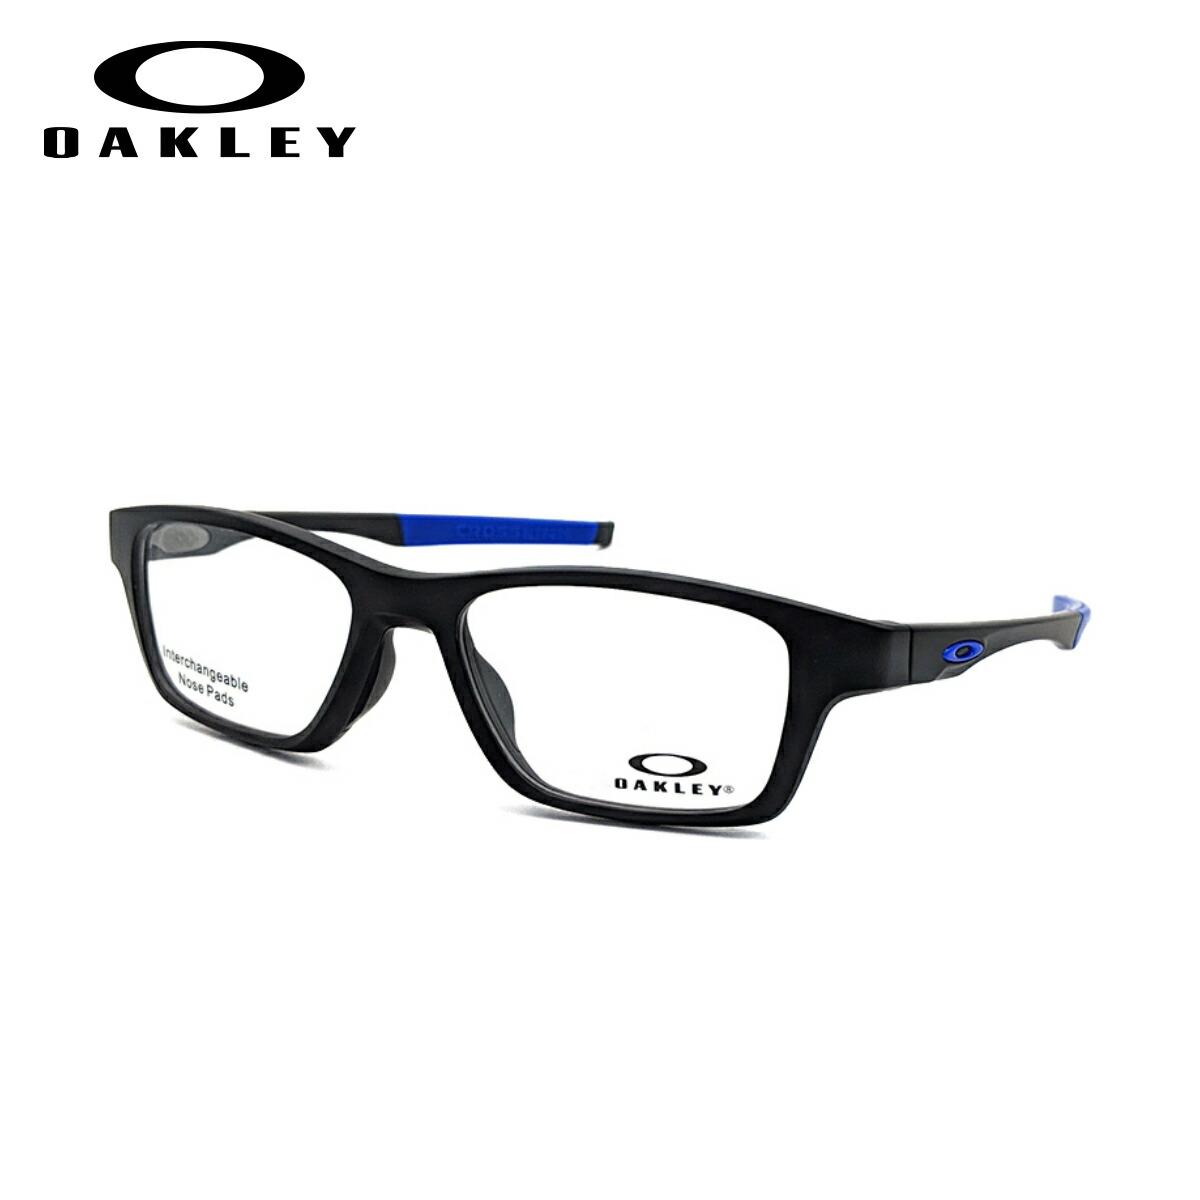 OAKLEY CROSSLINK HIGH POWER オークリー クロスリンク ハイパワー メガネ フレーム OX8117-04 52サイズ 度付き対応 近視 強度 度数 強い スポーツ オプサルミック 眼鏡 フレーム 軽い 軽量 丈夫 男性 メンズ 女性 レディース 【送料無料】